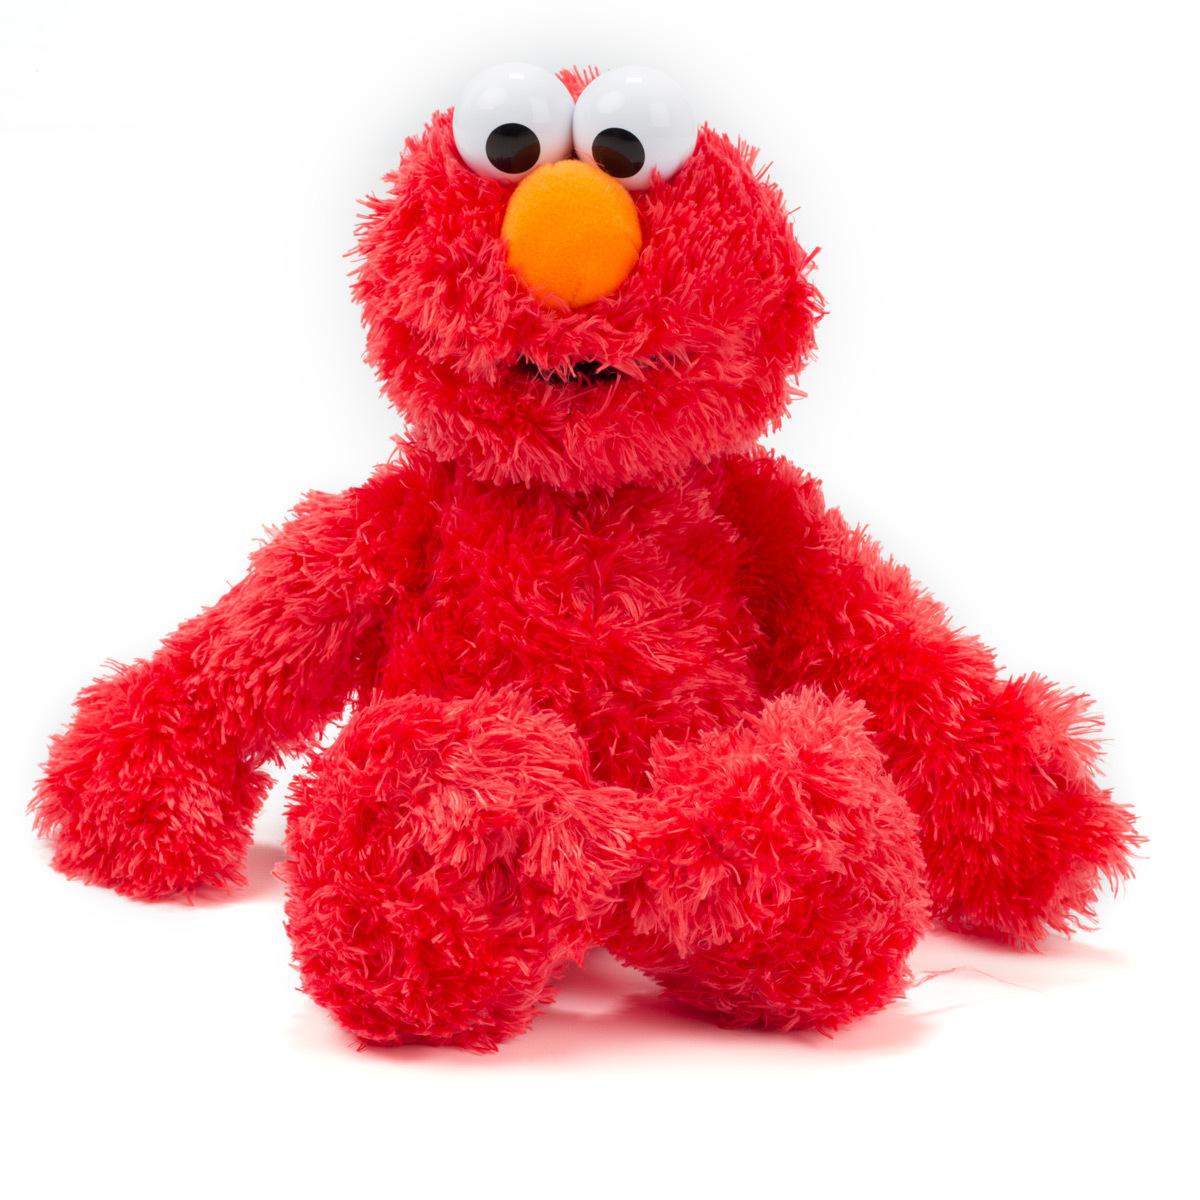 Sesame Street - Elmo Plush